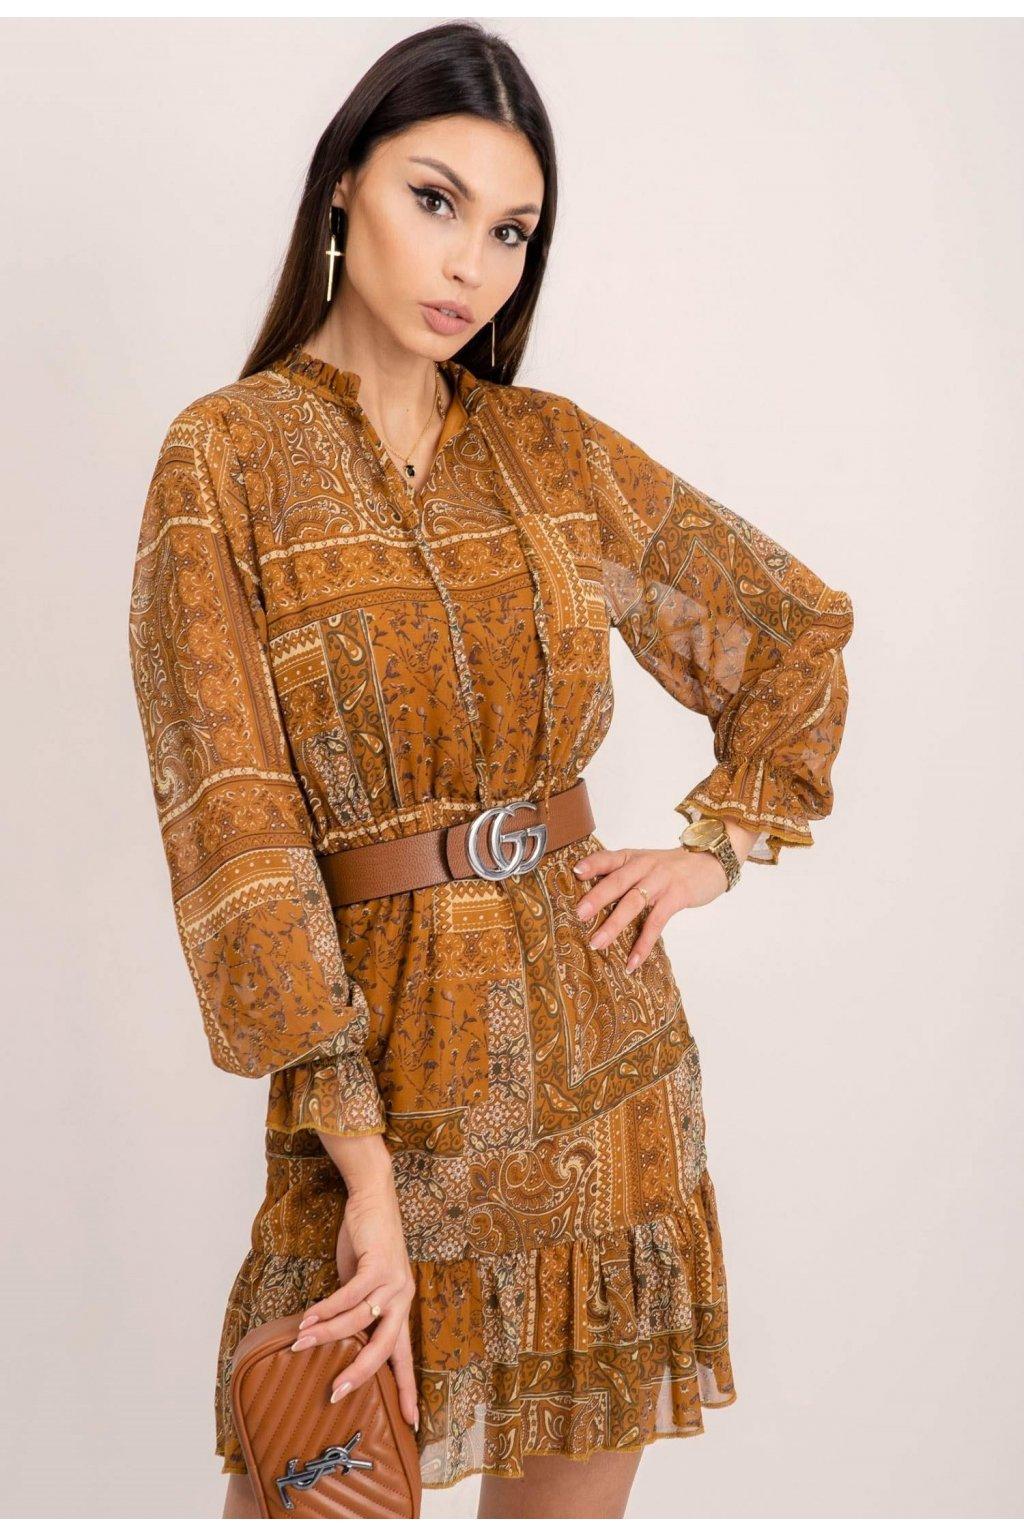 Hnedé dámske šaty s potlačou